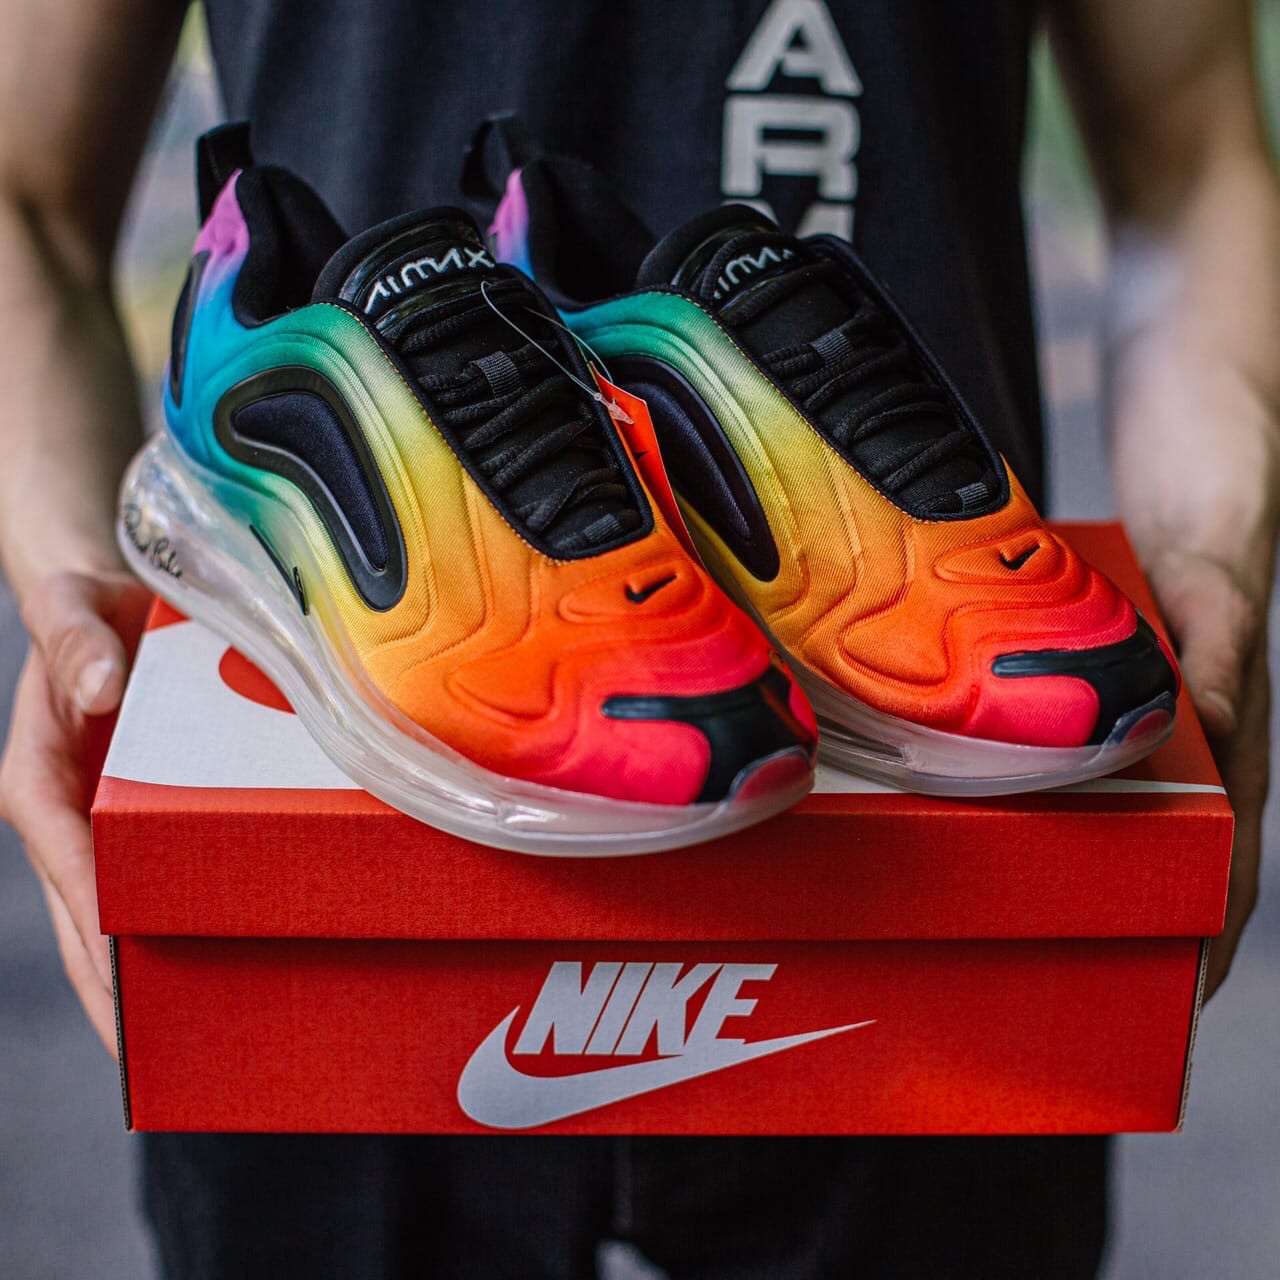 Мужские Кроссовки Nike Air Max 720 (реплика)